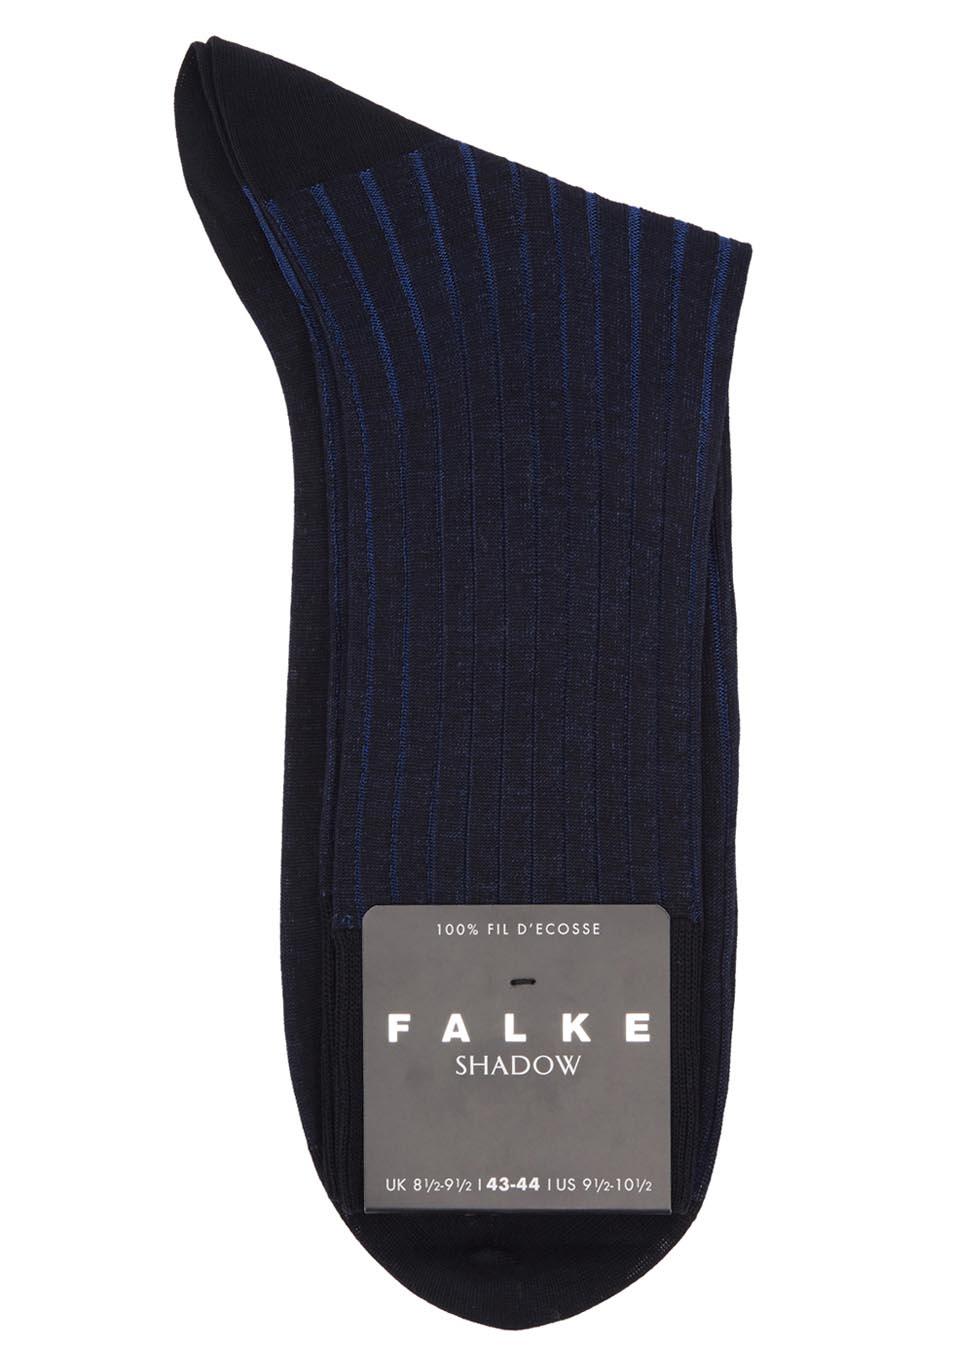 Shadow black ribbed cotton socks - Falke